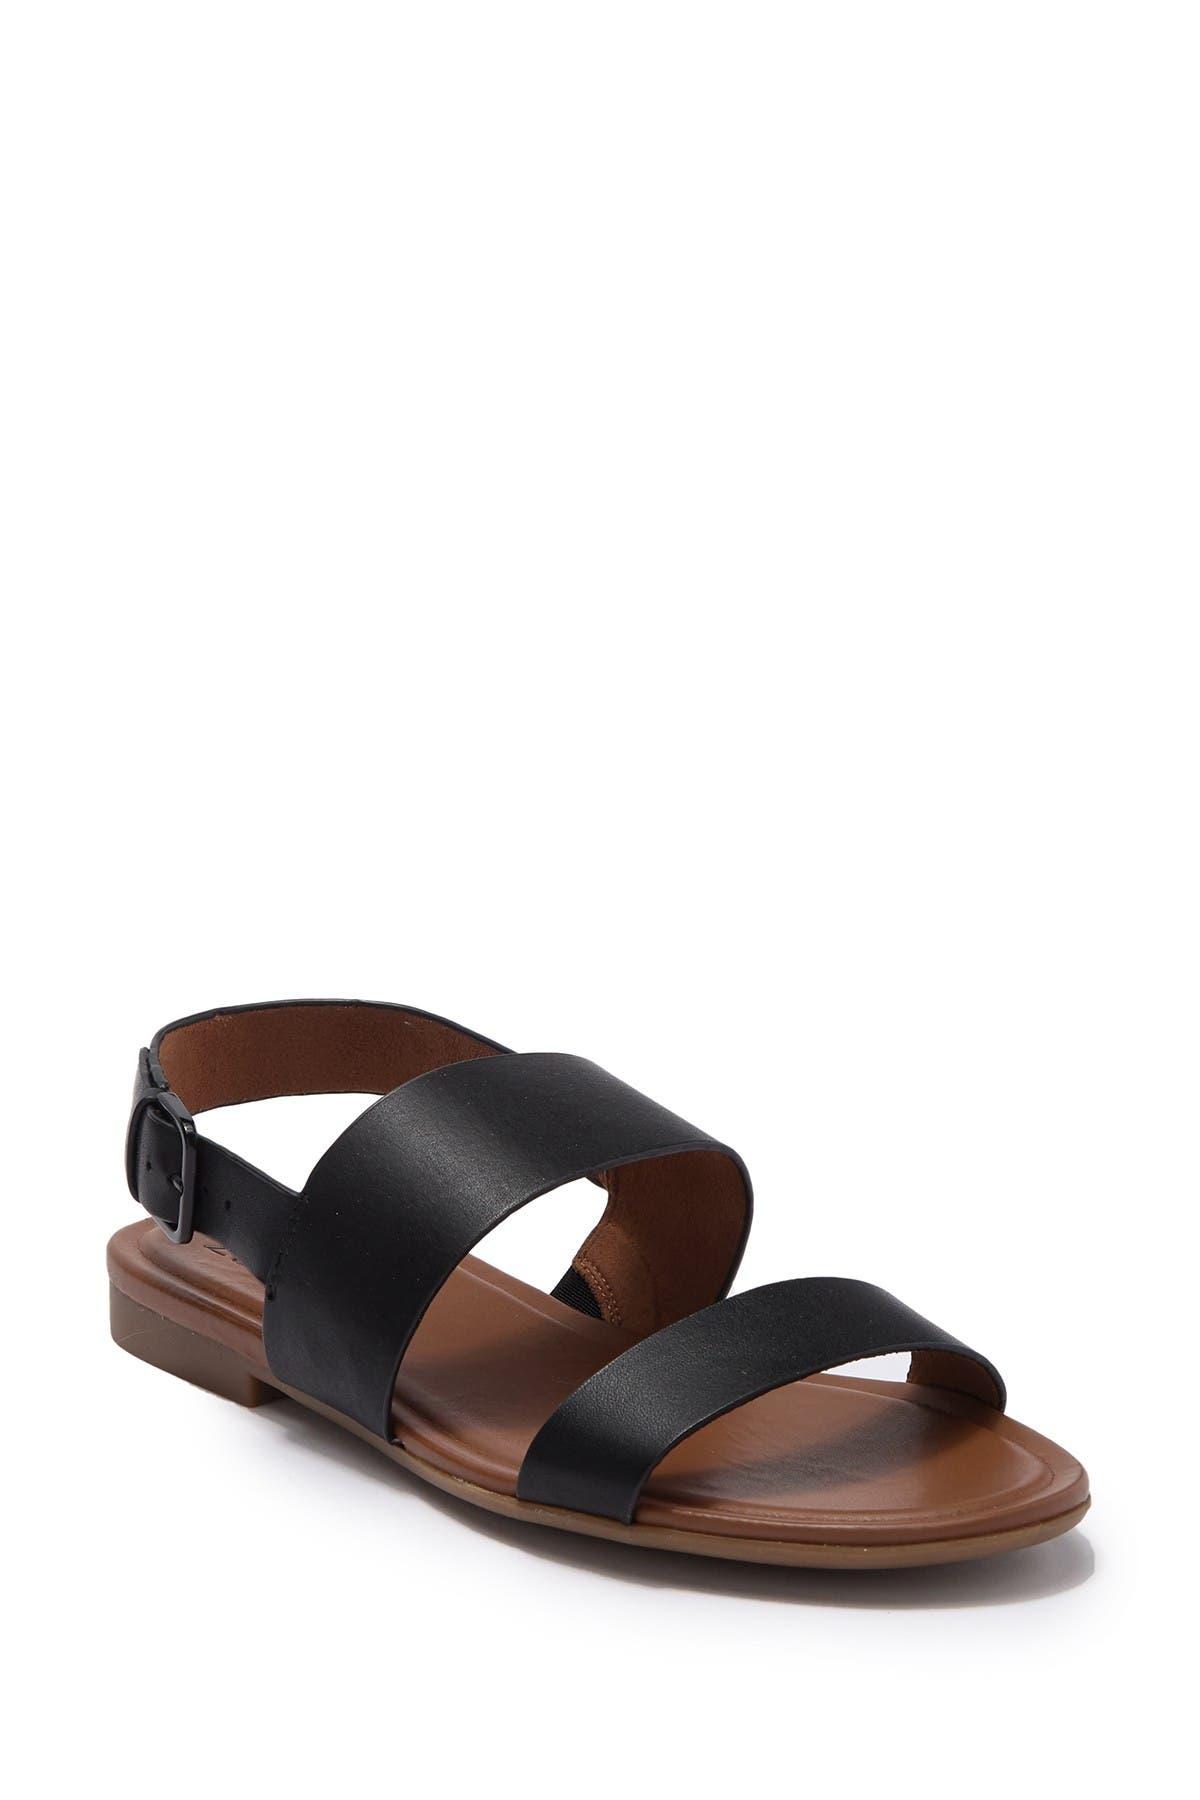 Naturalizer   Shaleah Open Toe Sandal